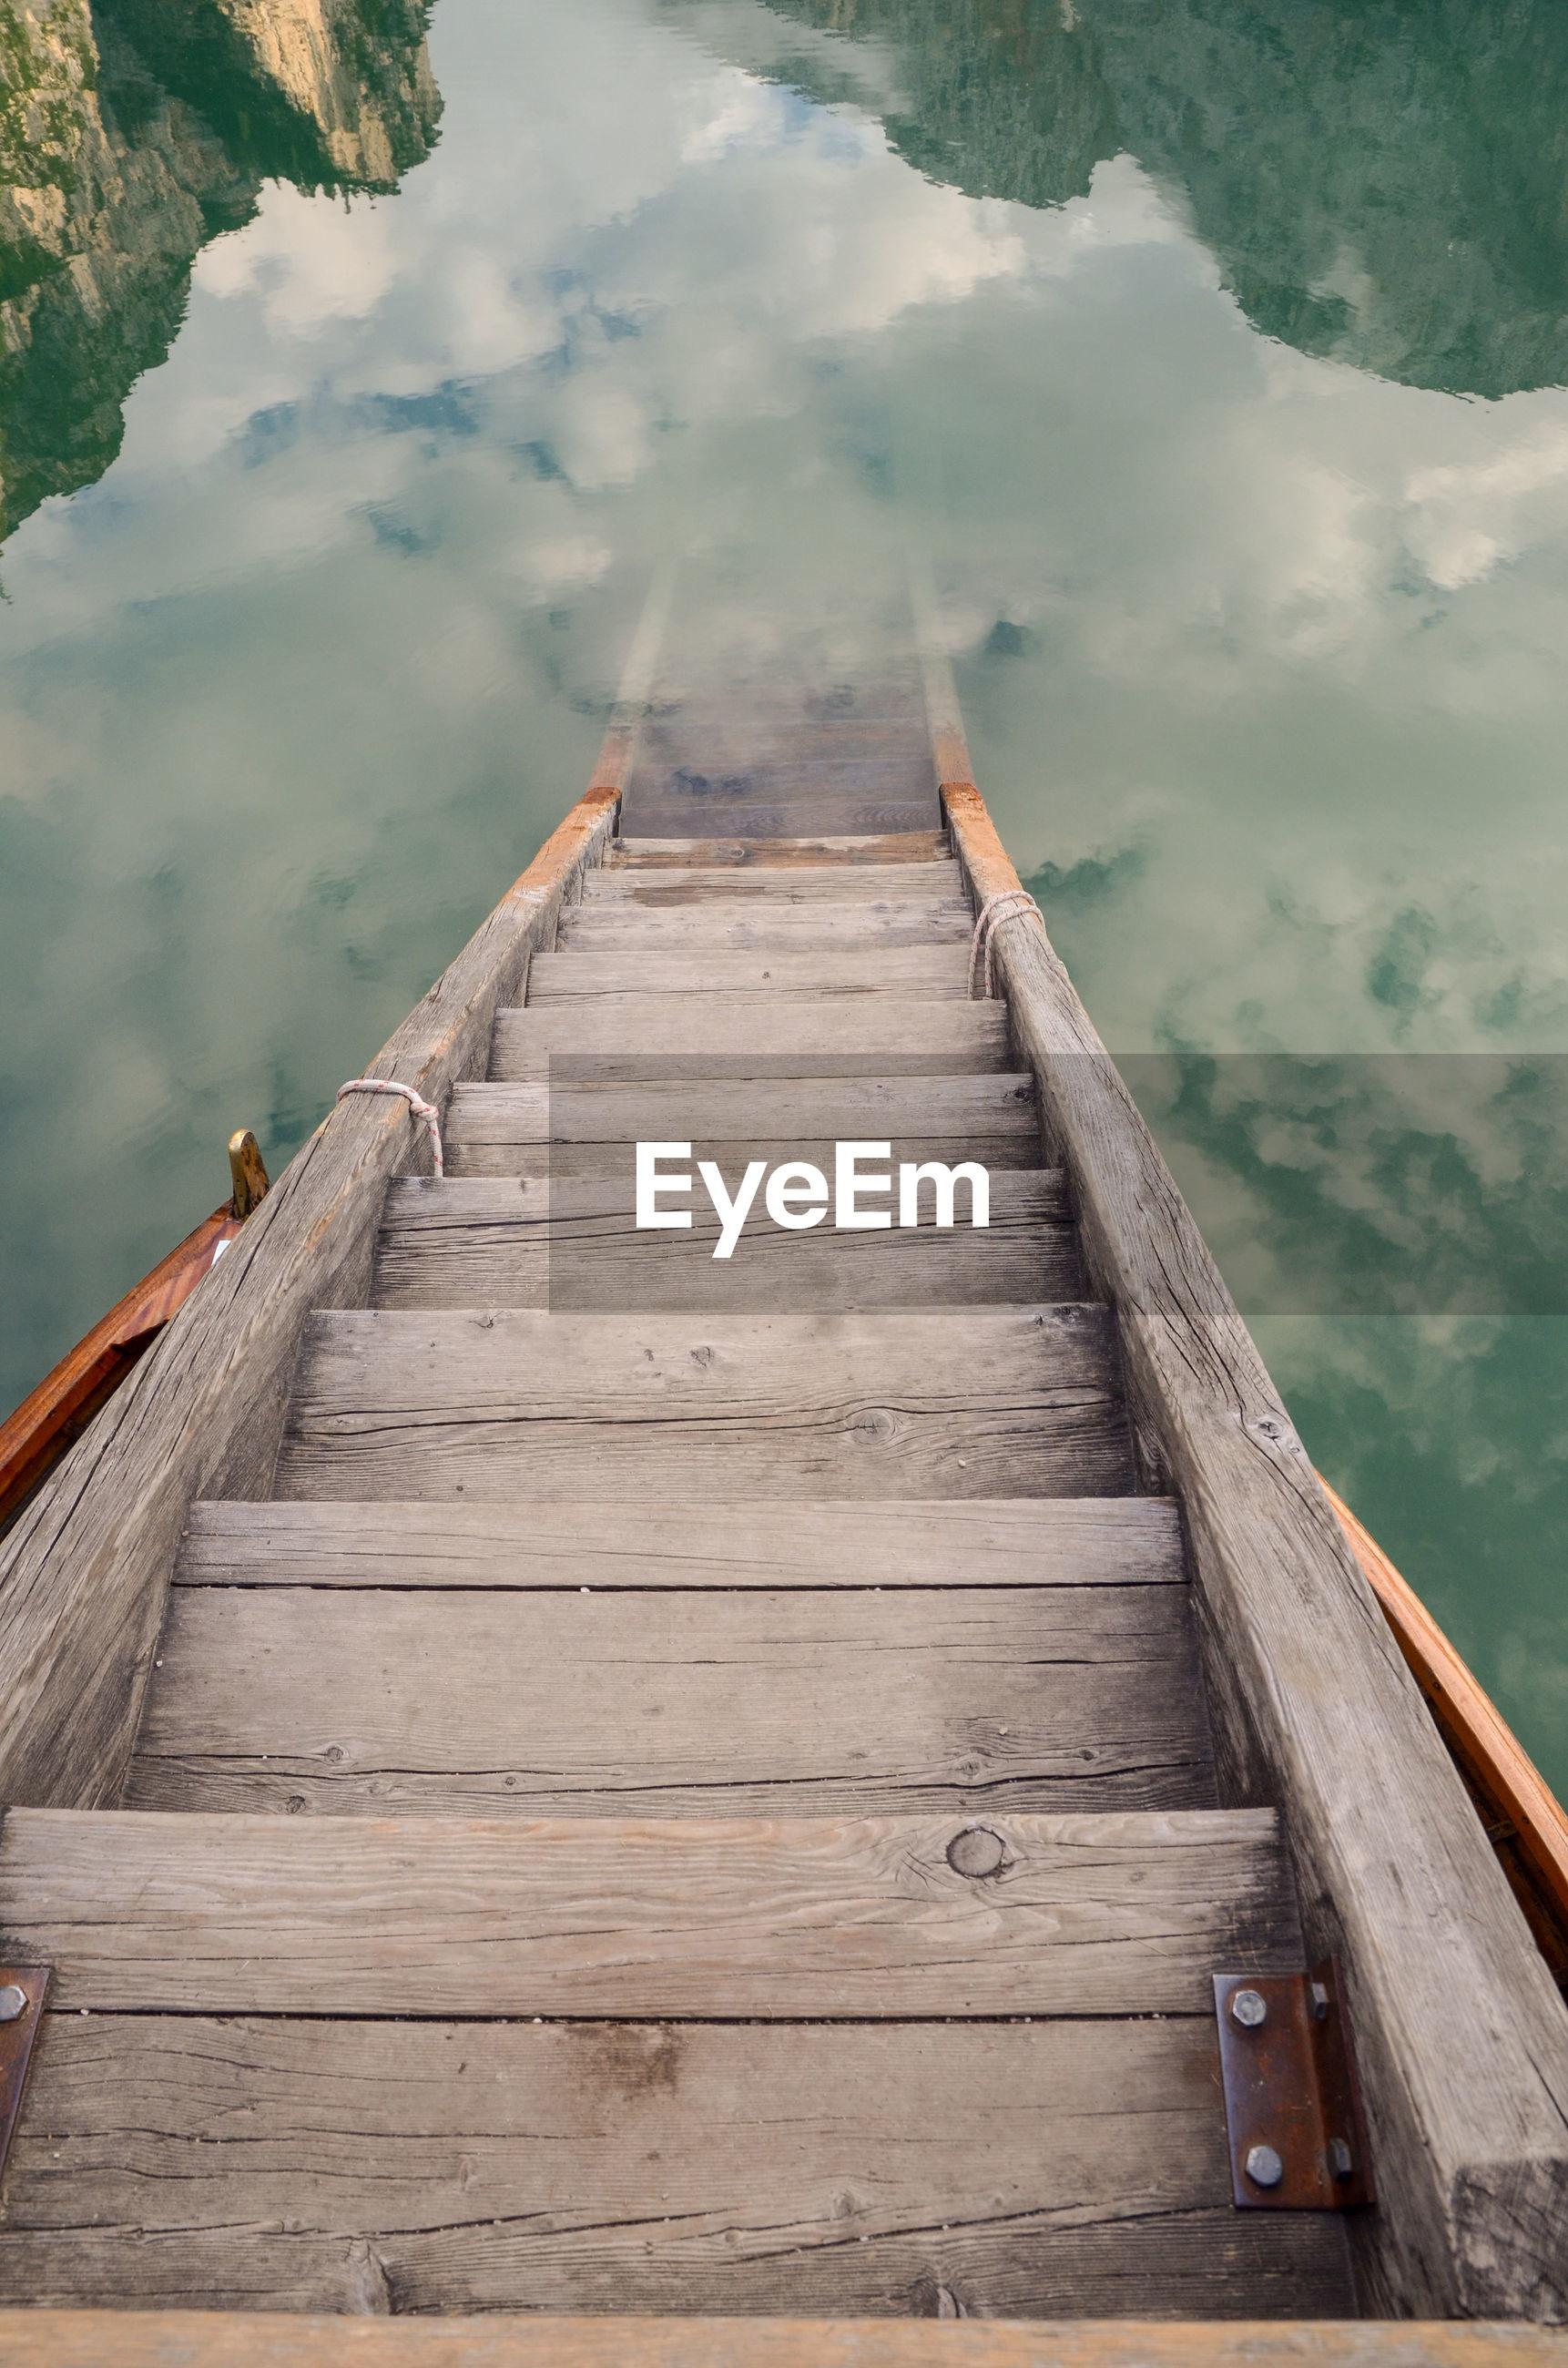 Surface level of wooden footbridge over pier against sky